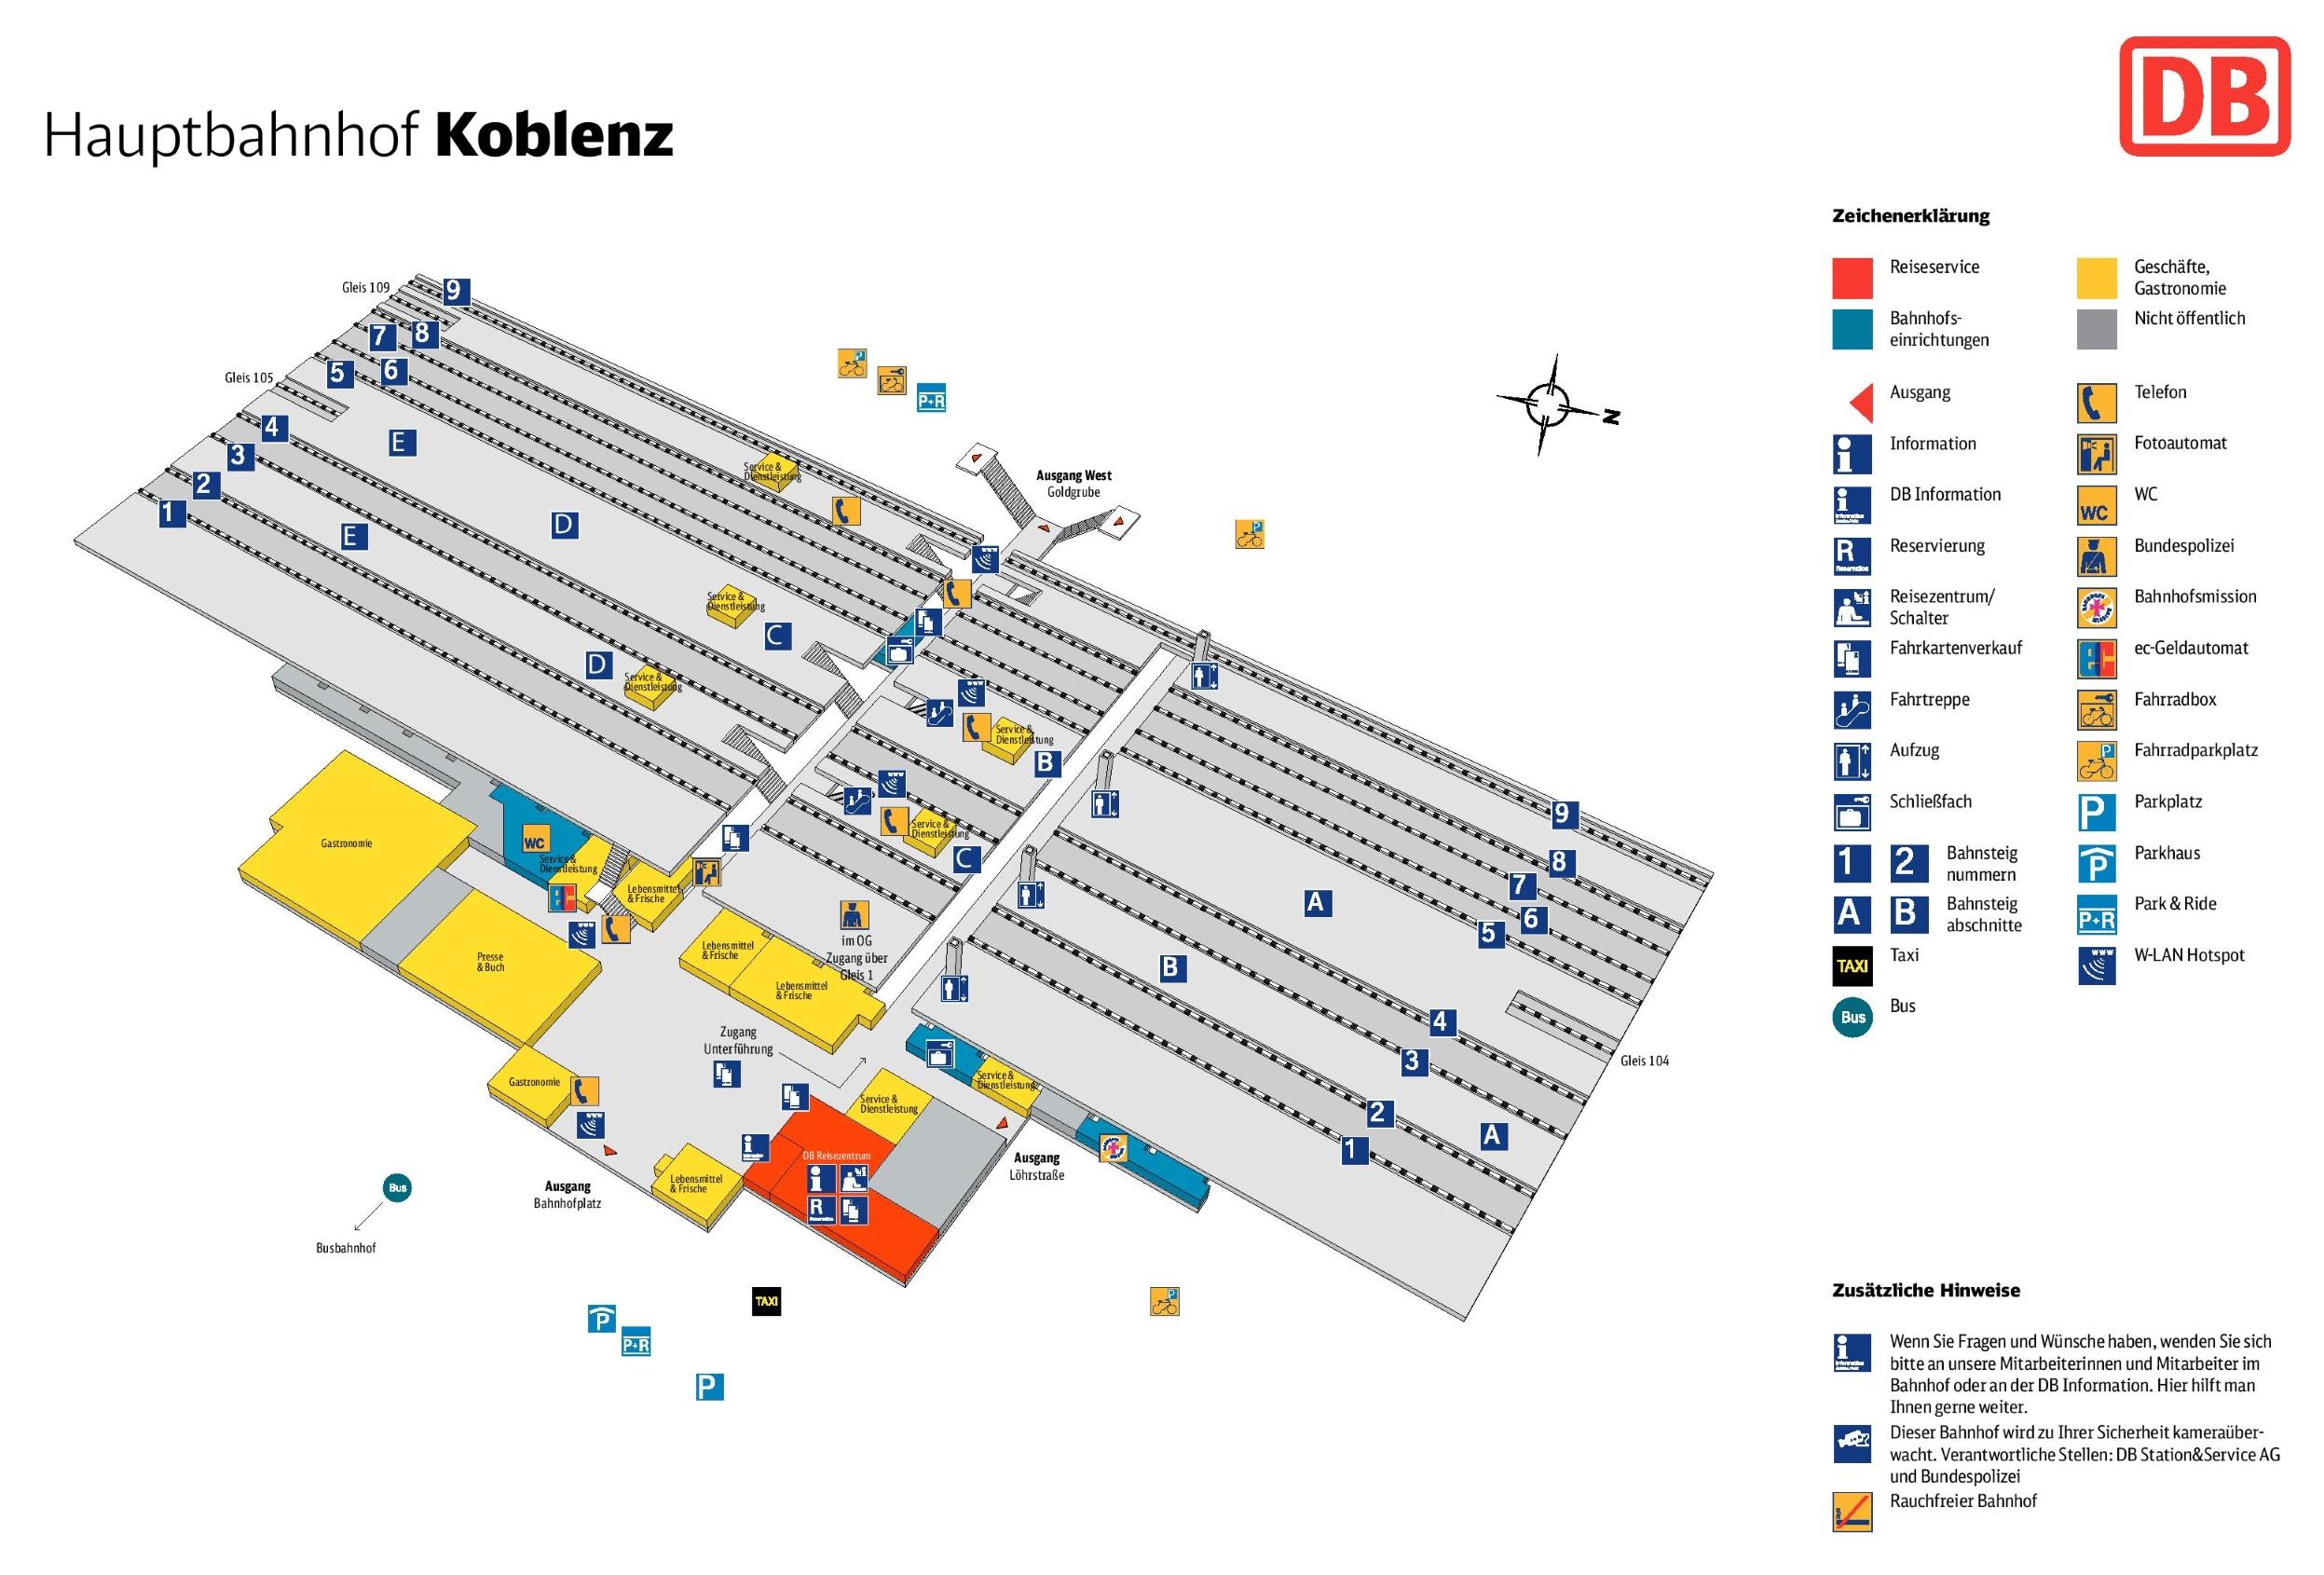 Koblenz hauptbahnhof map